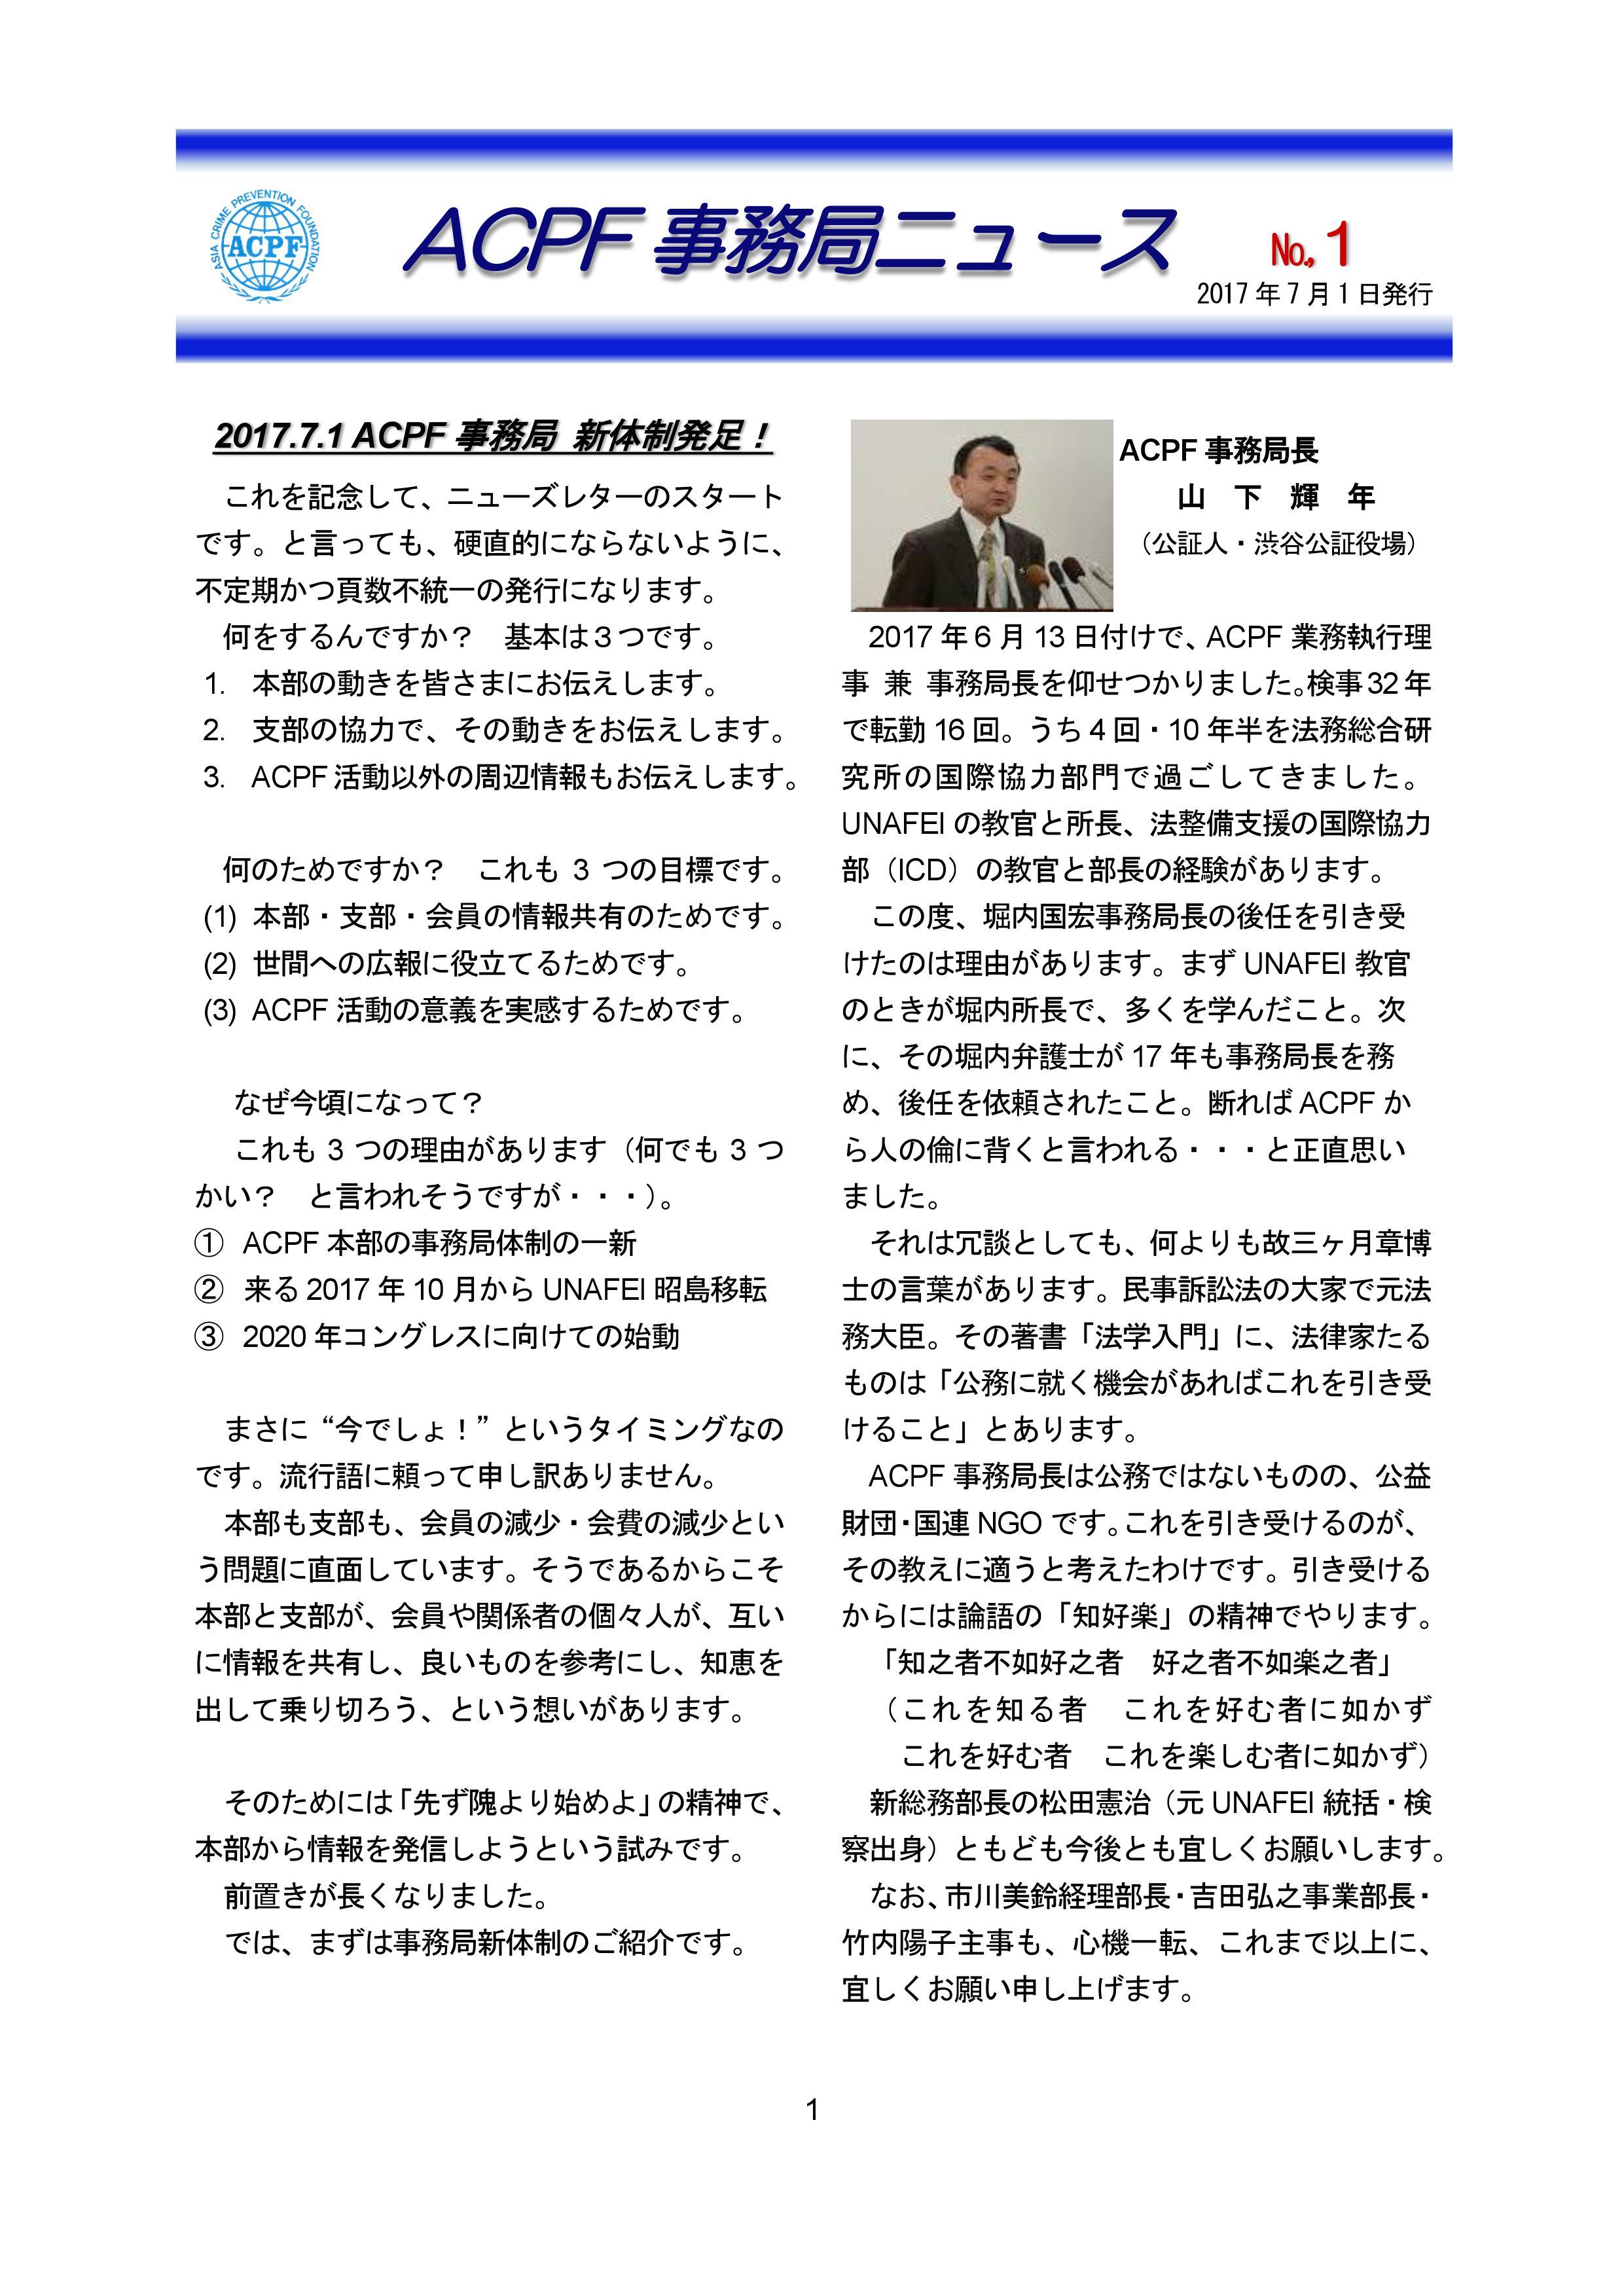 ACPF NEWS No.1